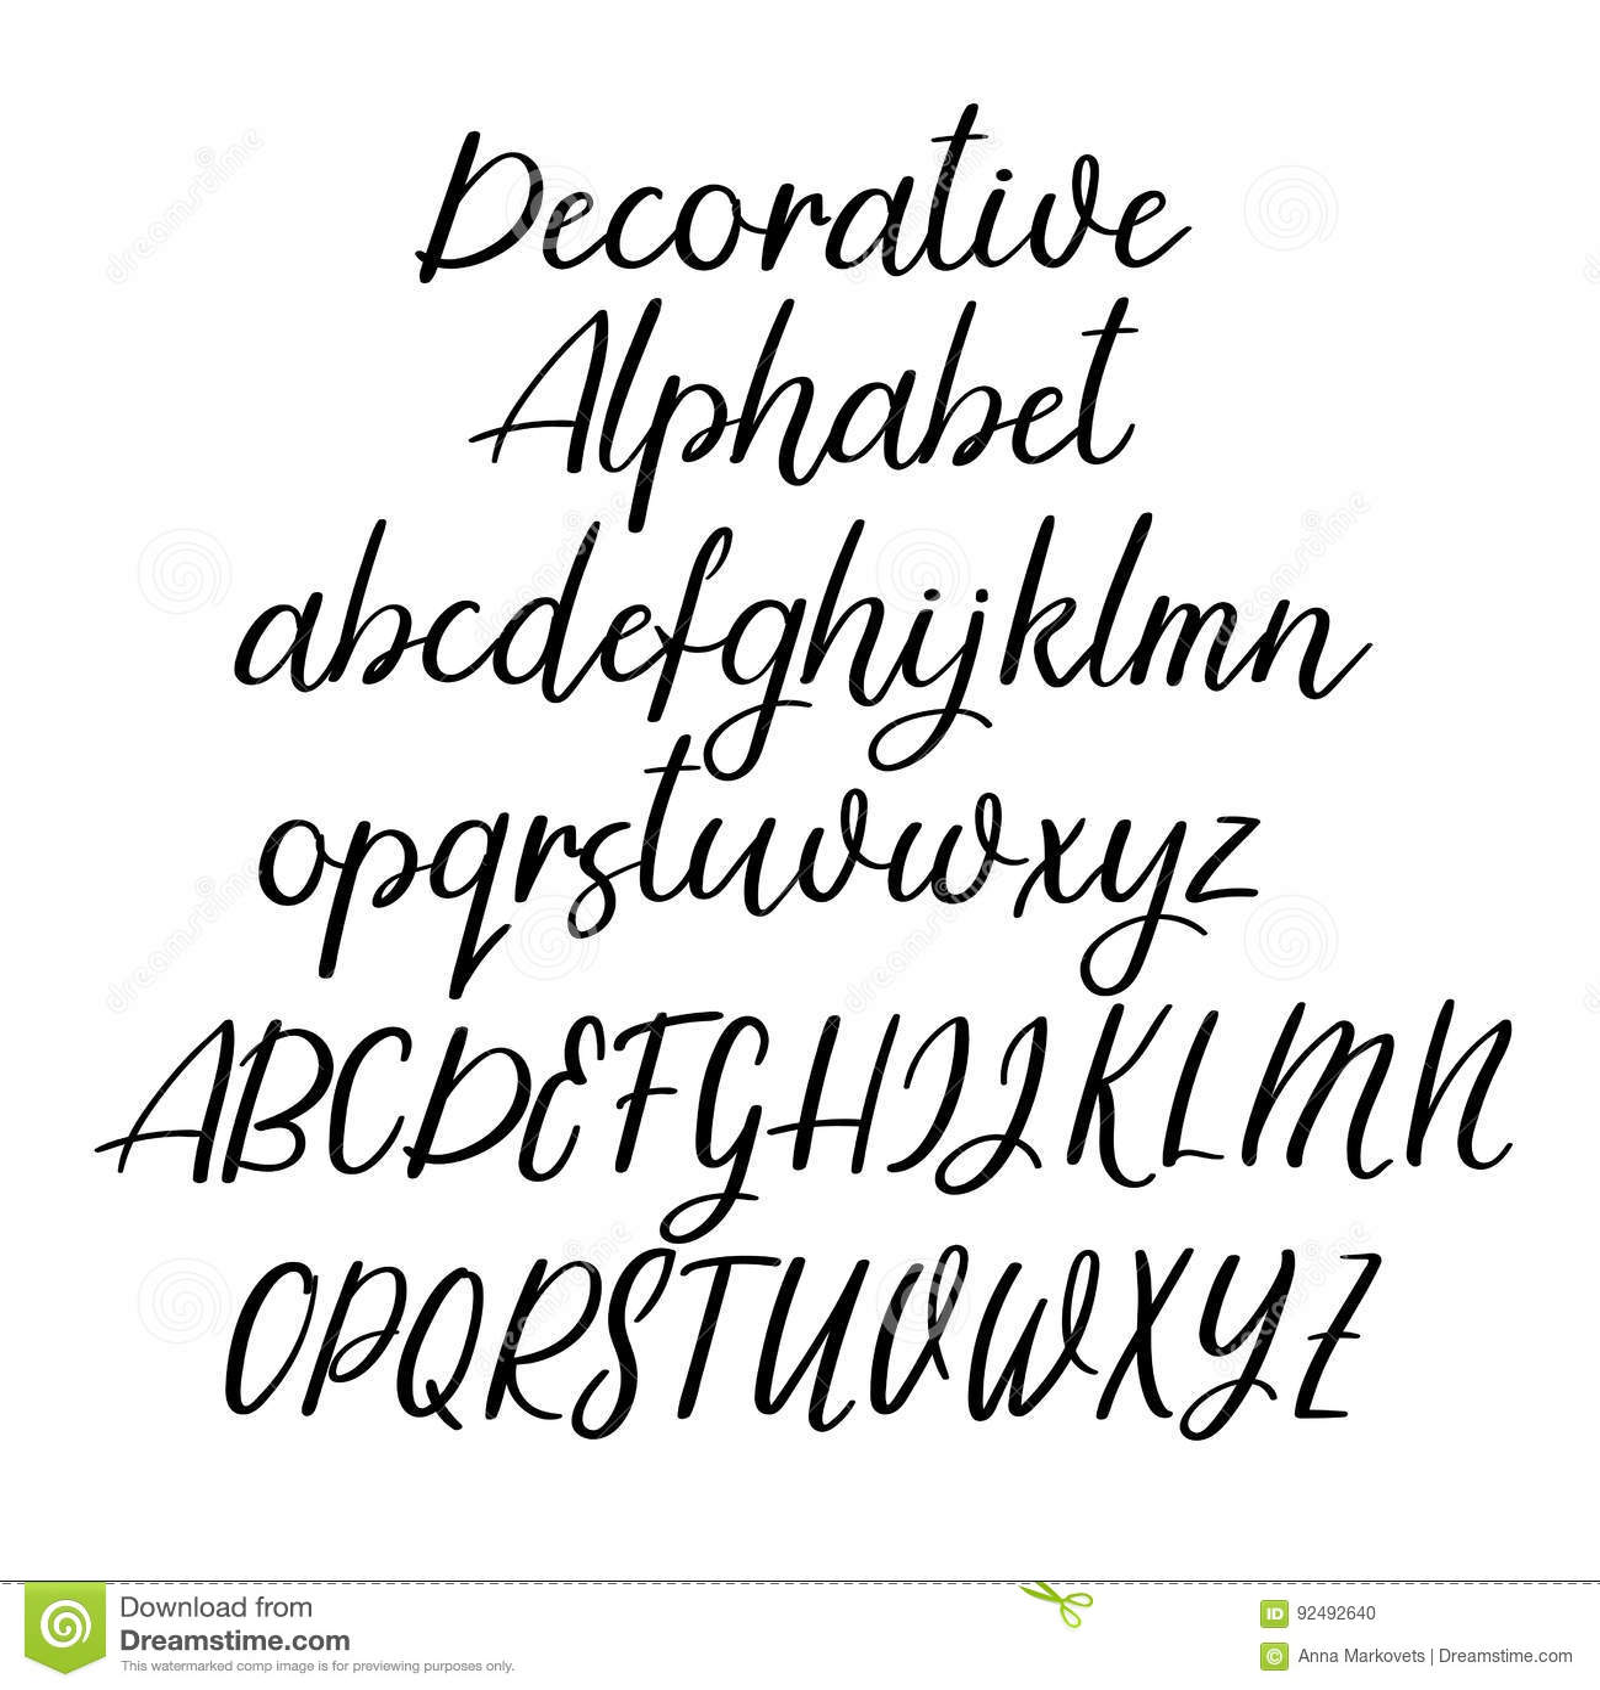 Decorative Calligraphic Alphabet Handwritten Brush